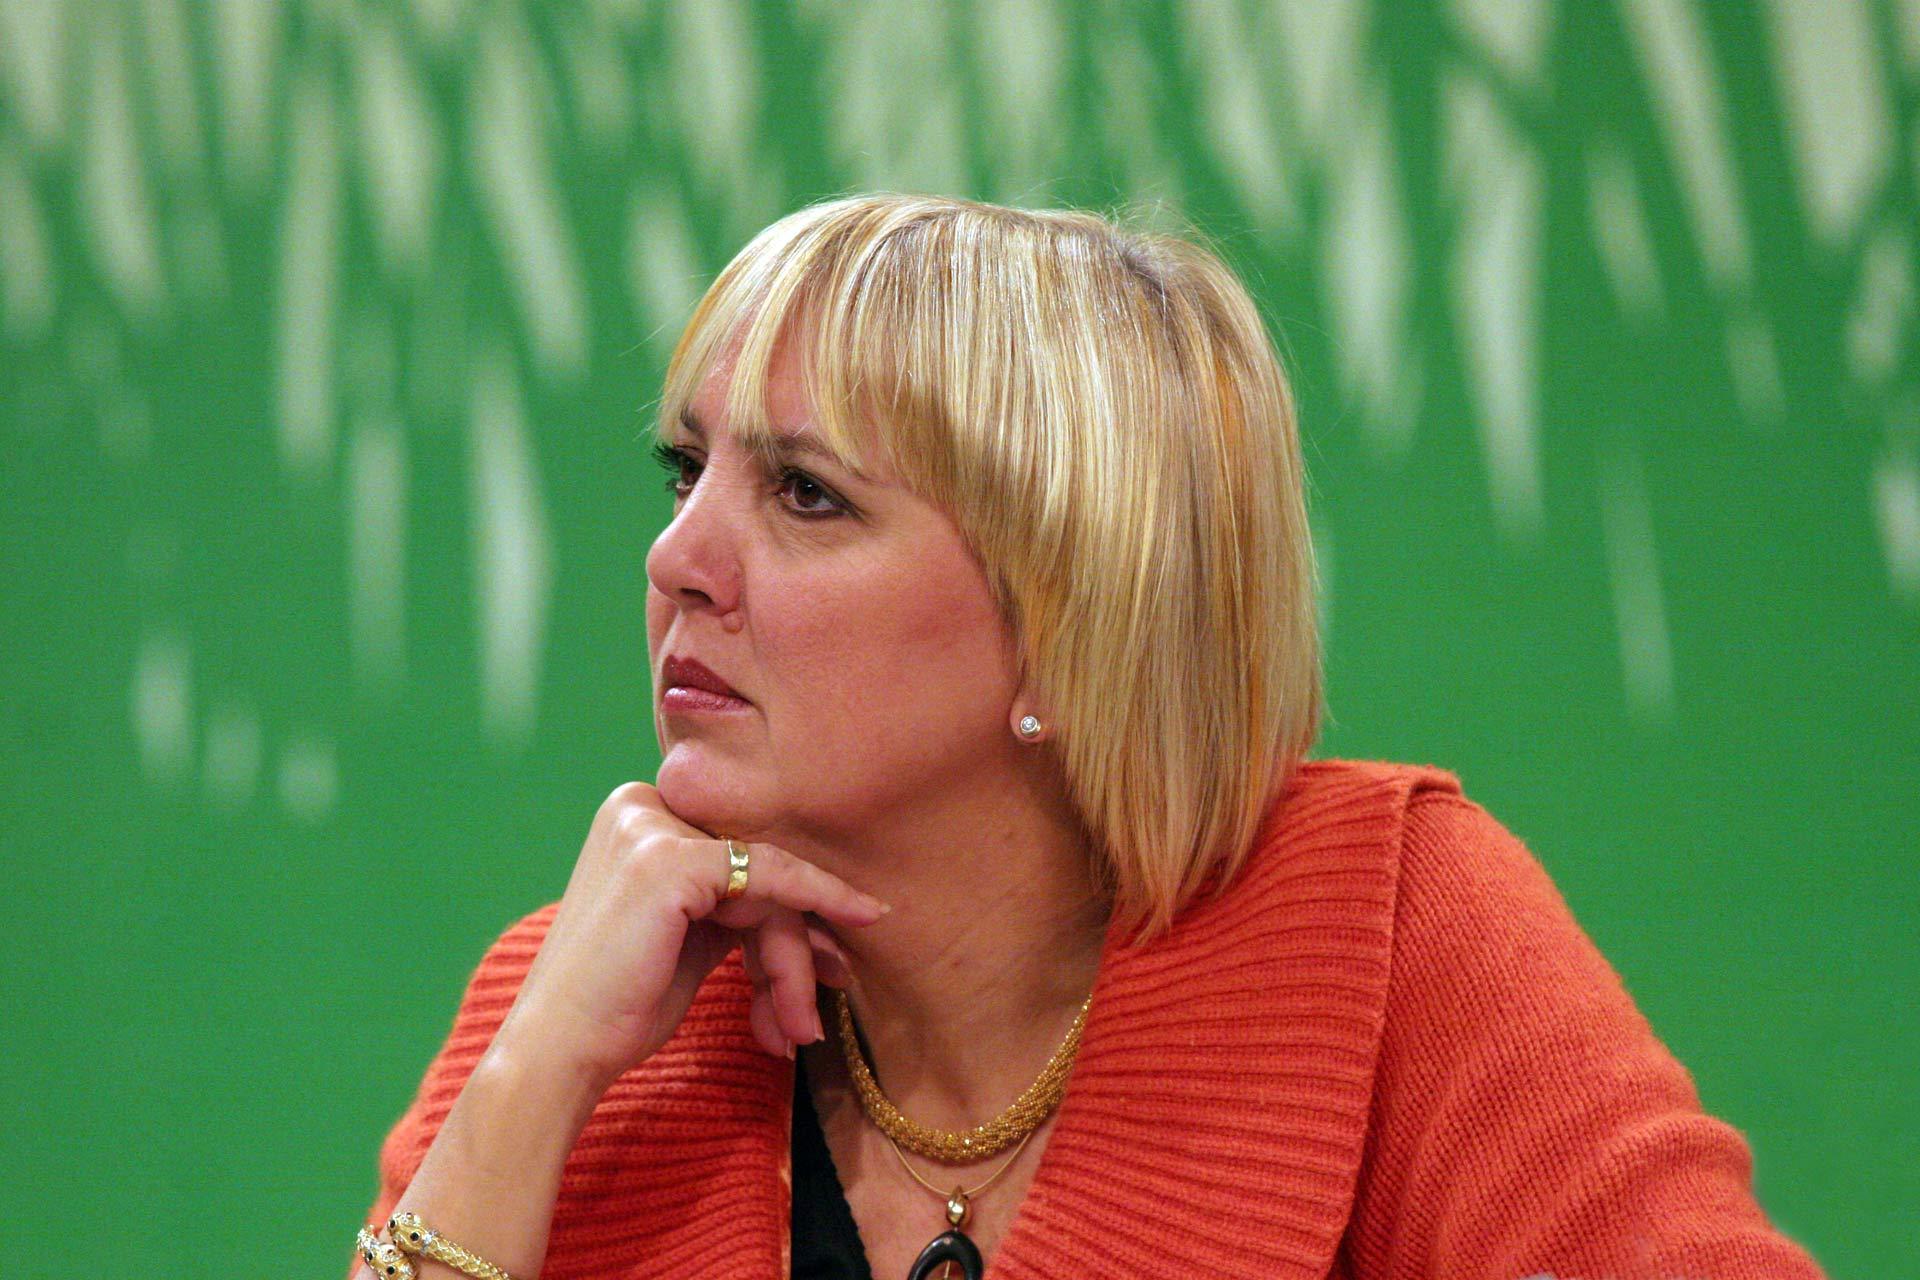 Bundesparteitag in Nürnberg, Claudia Roth /BÜNDNIS 90 - DIE GRÜNEN